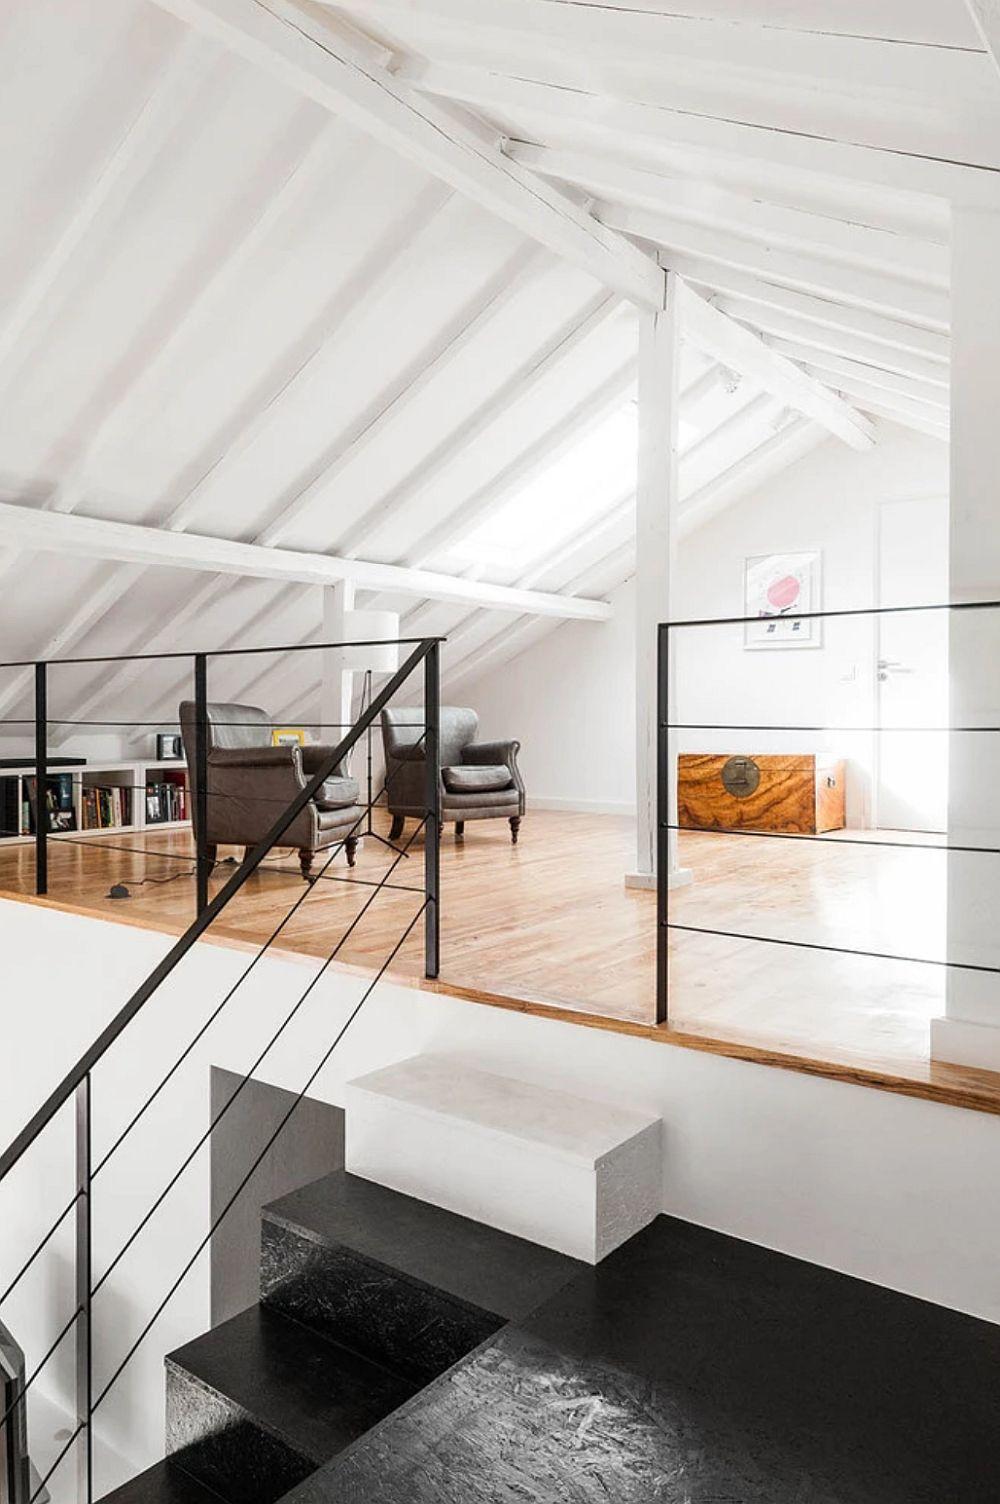 adelaparvu.com despre casa amenajata in grajd, Casa Celerio, arhitectura Ines Brandao (9)